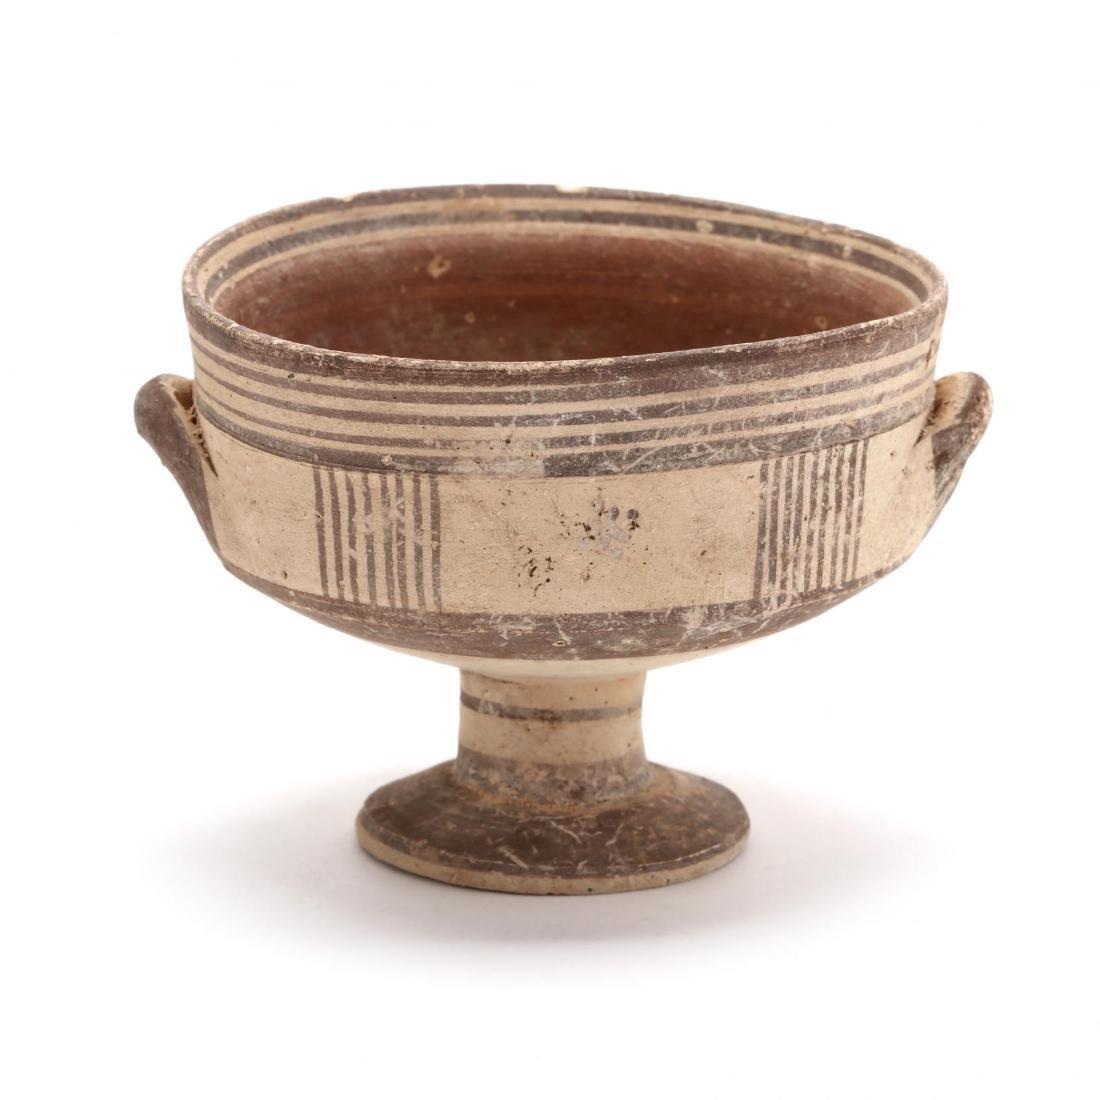 Cypro-Geometric Bichrome Stemmed Cup